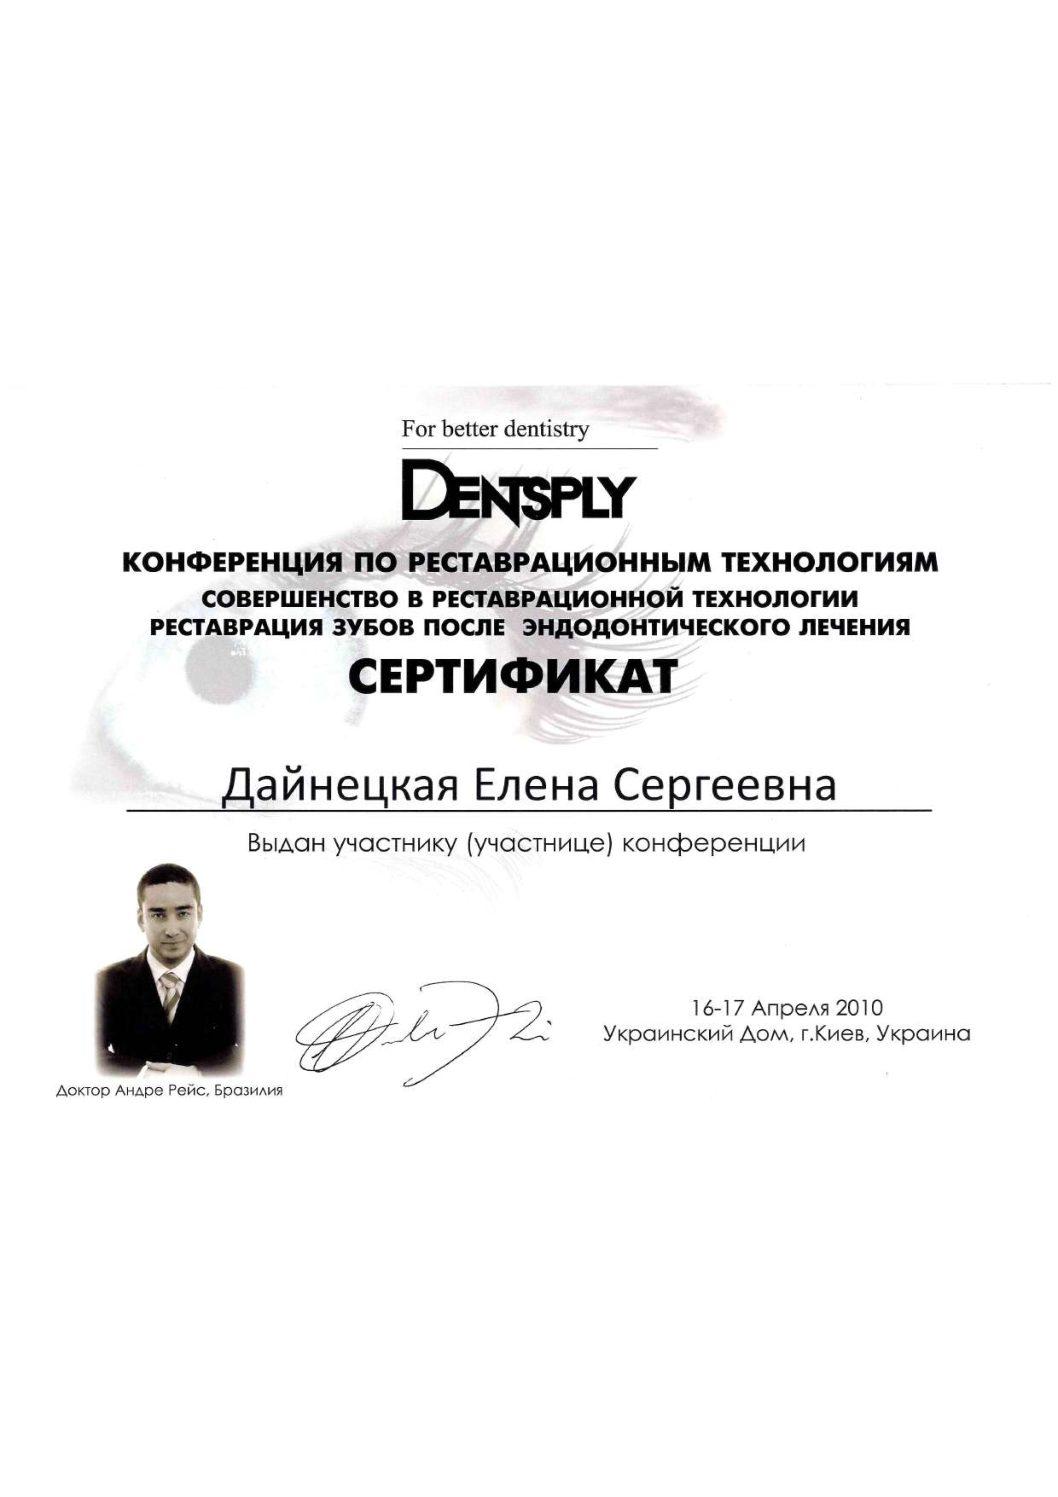 Untitled.FR26.tif compressed pdf - Олена Дайнецька